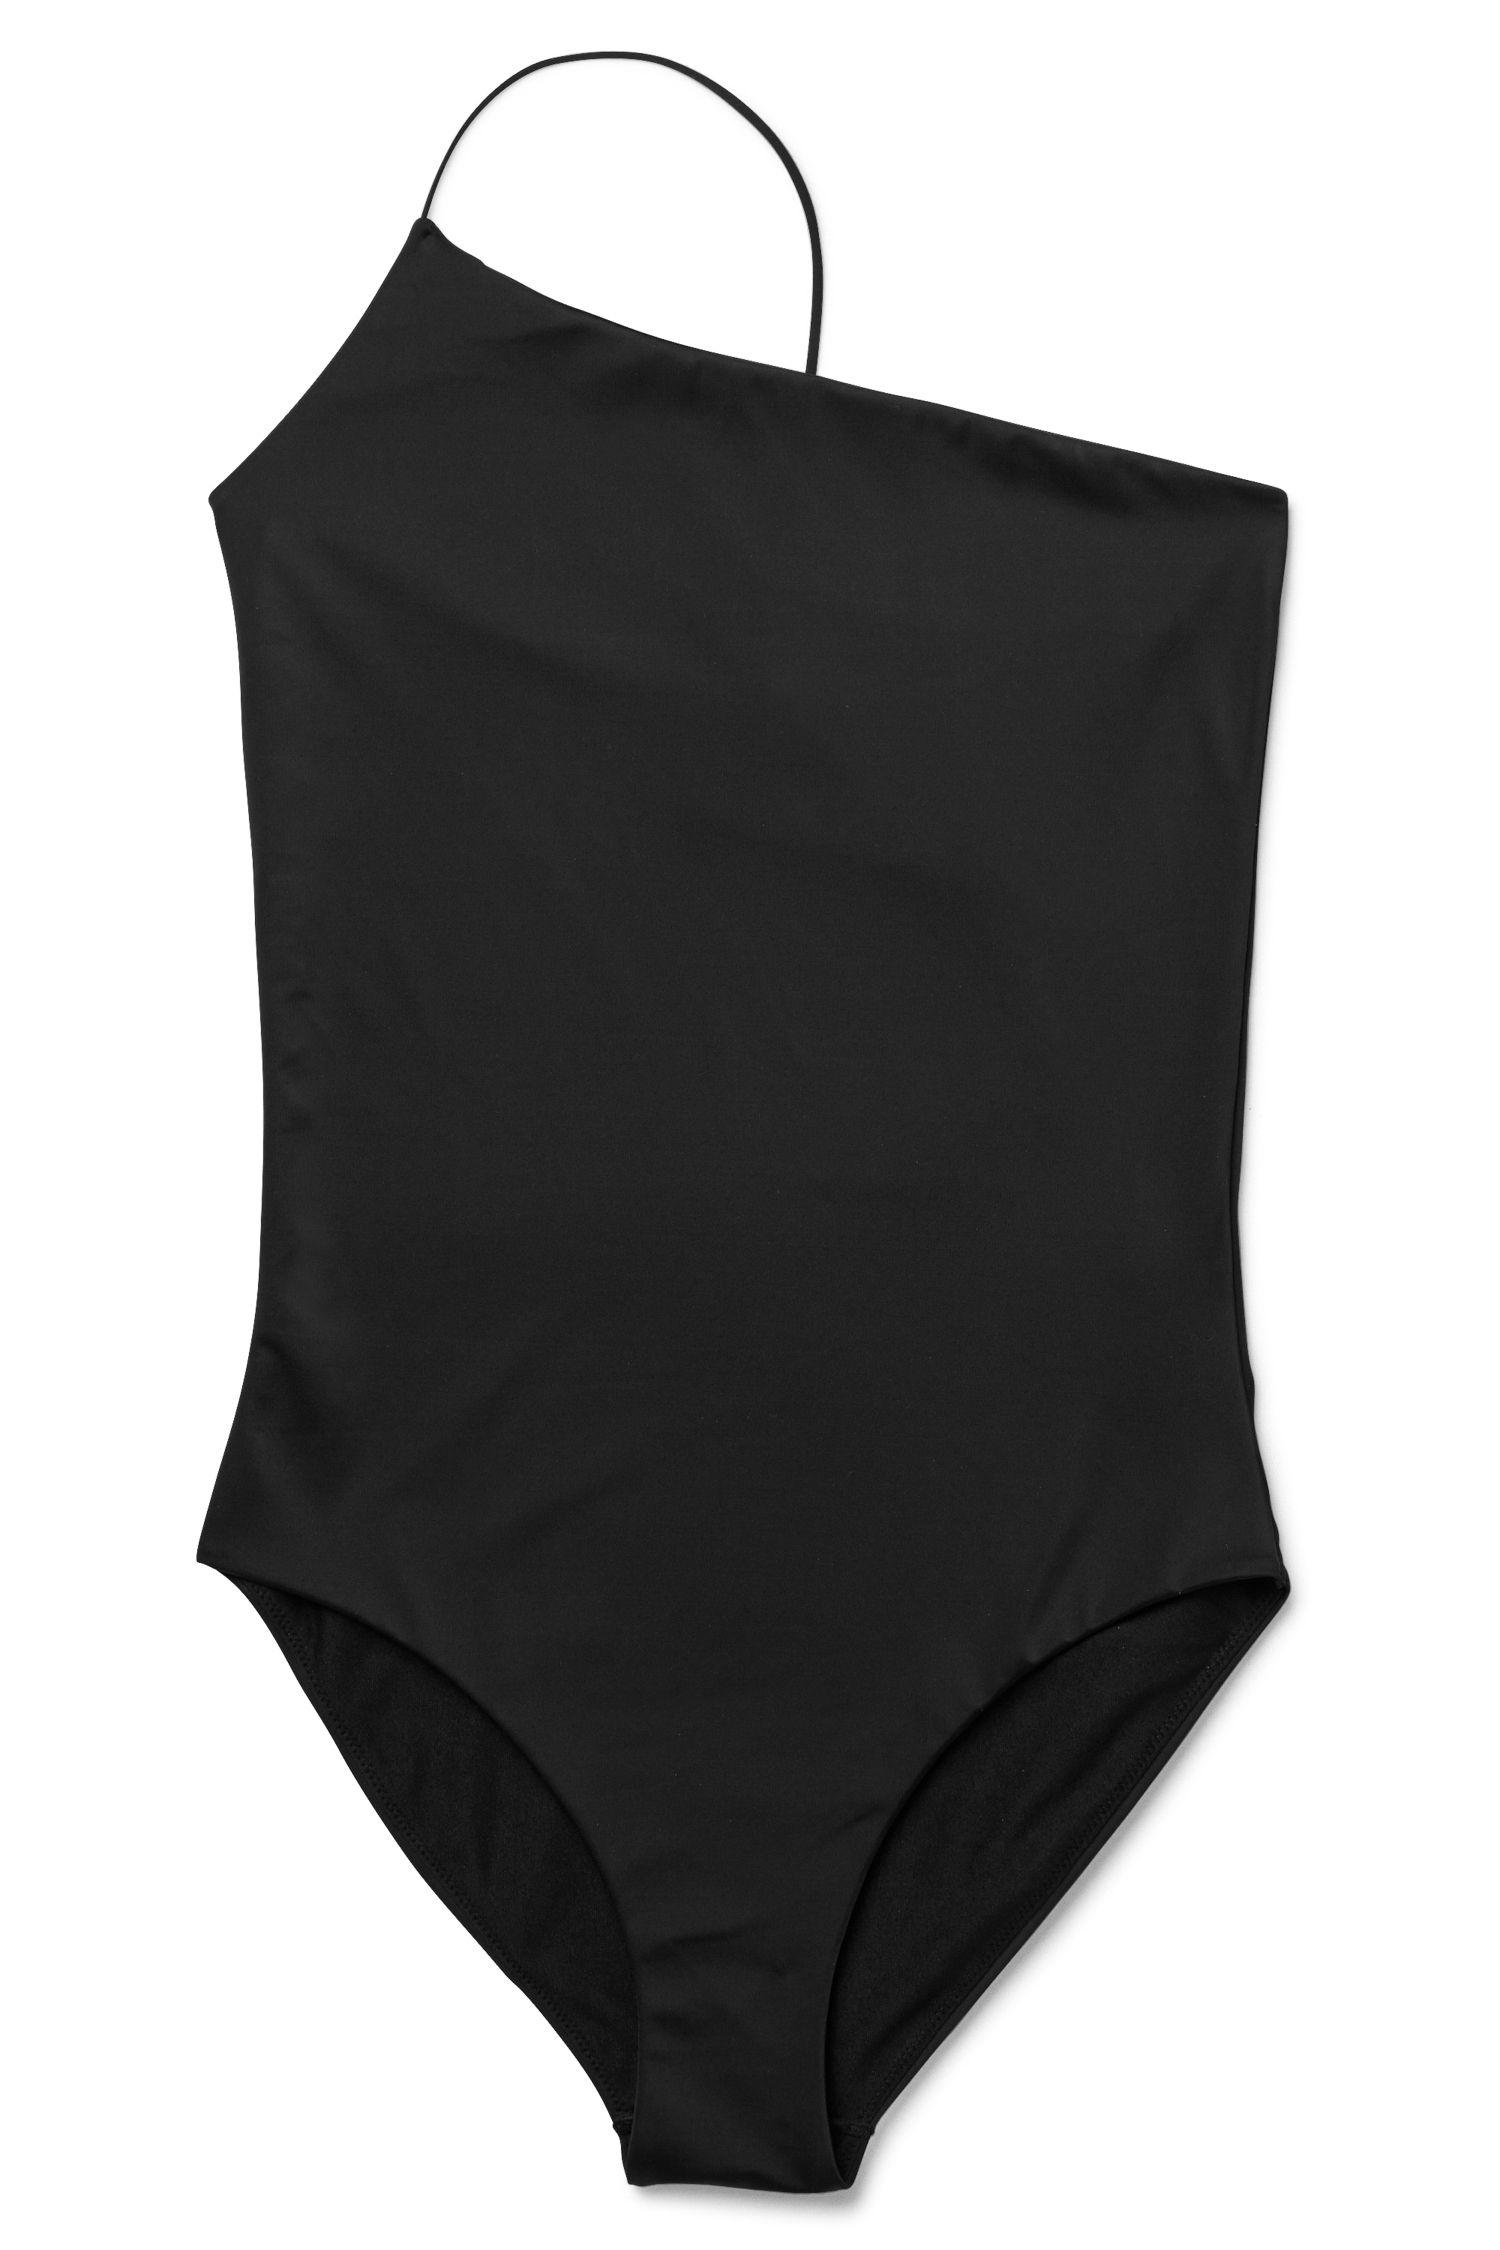 94ce960799c Weekday Coral Swimsuit in Black | Clothes | Trajes de baño, Trajes ...